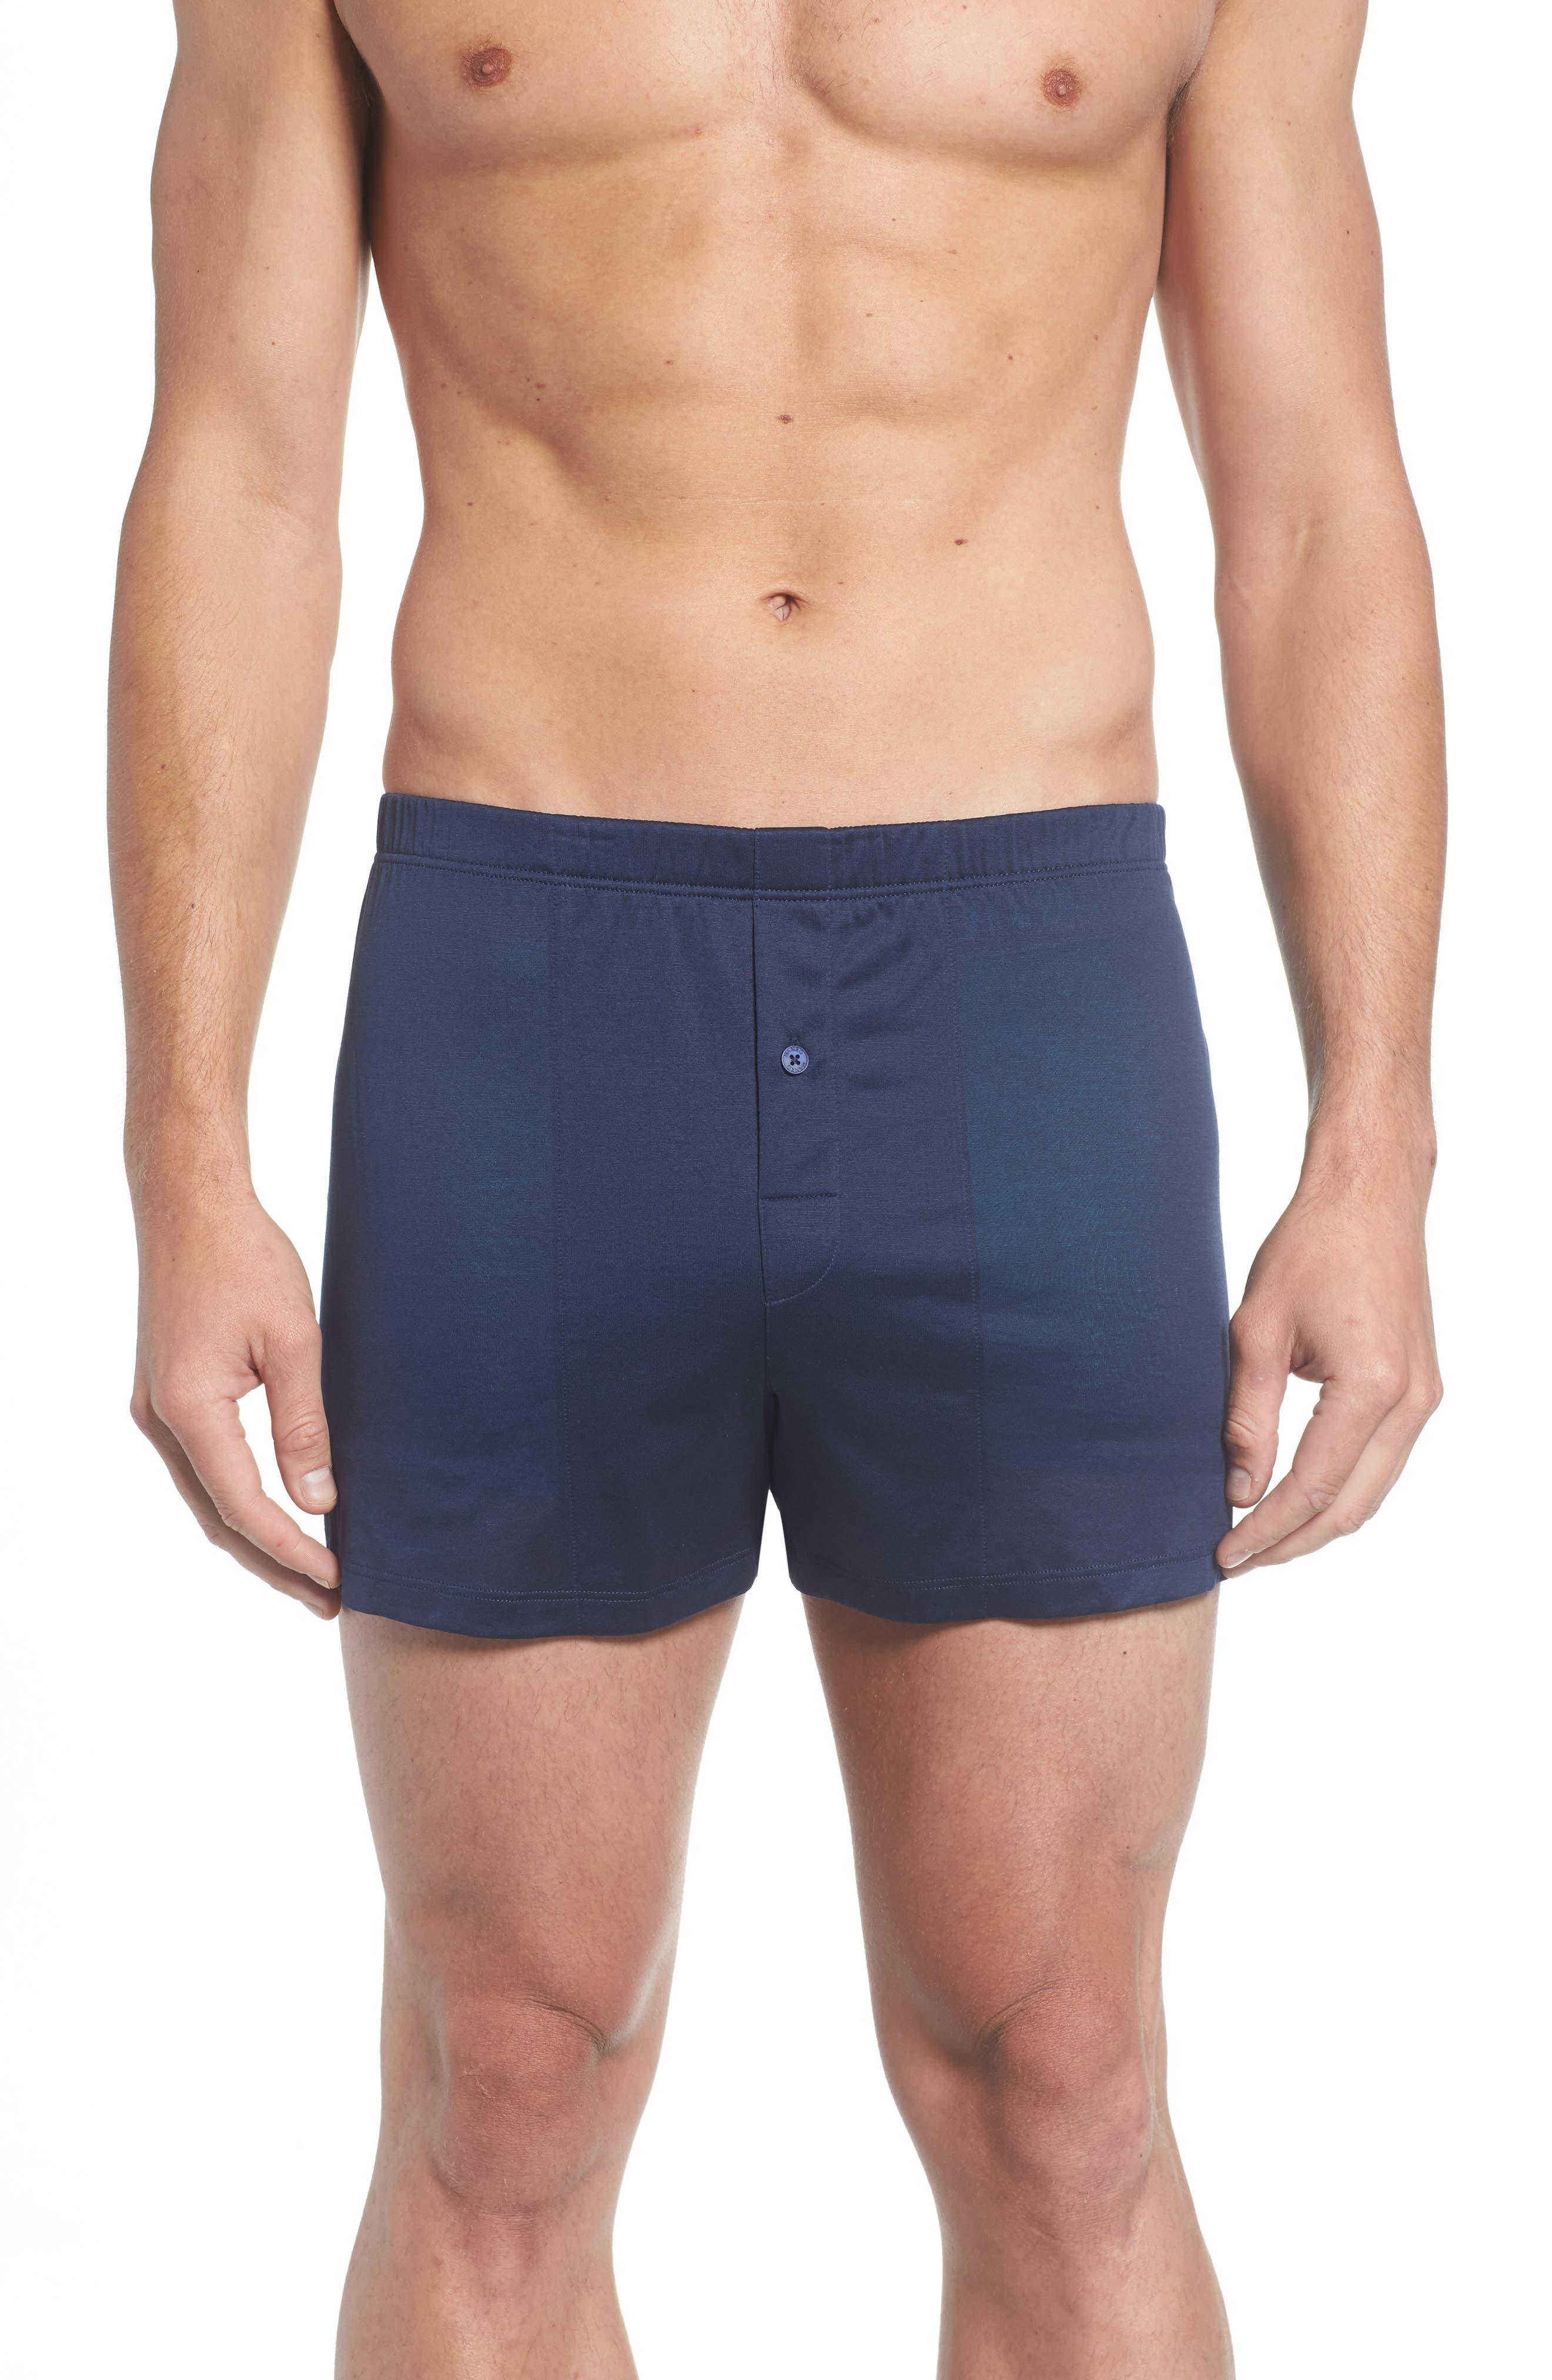 Hanro Cotton Sporty Knit Boxers